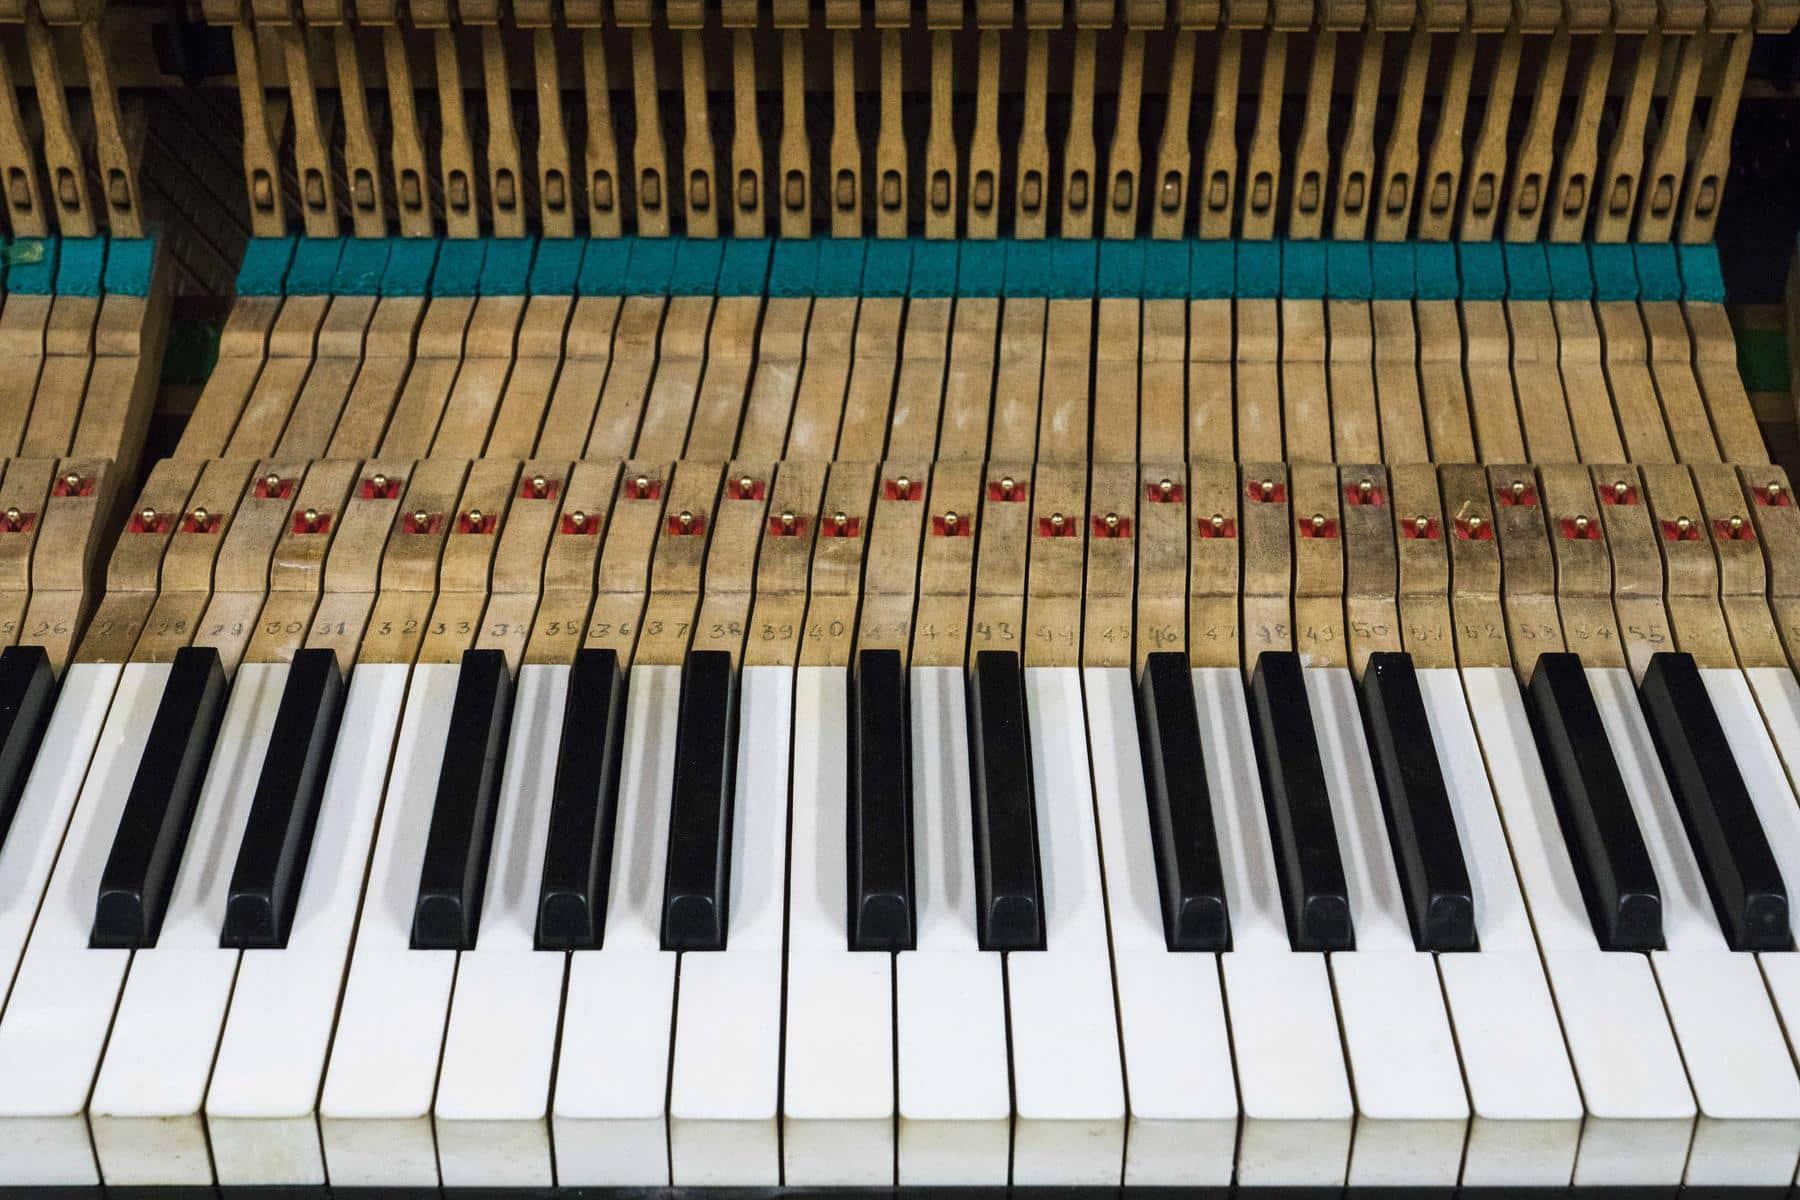 réglage clavier de piano